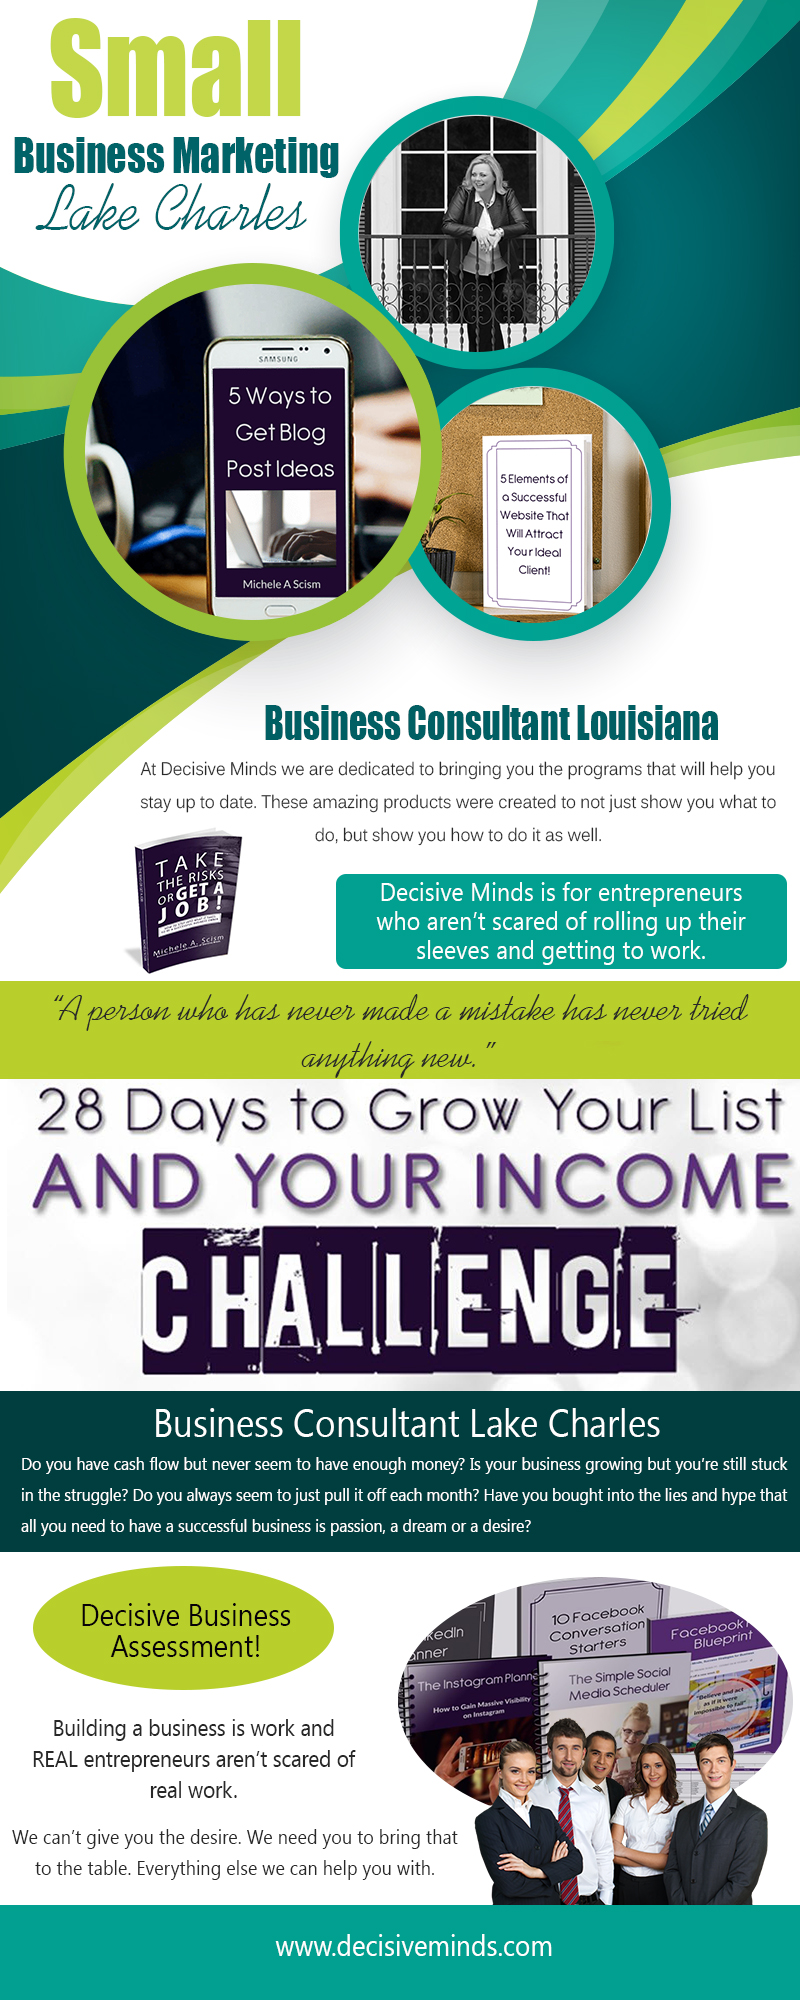 Small Business Marketing Lake Charles